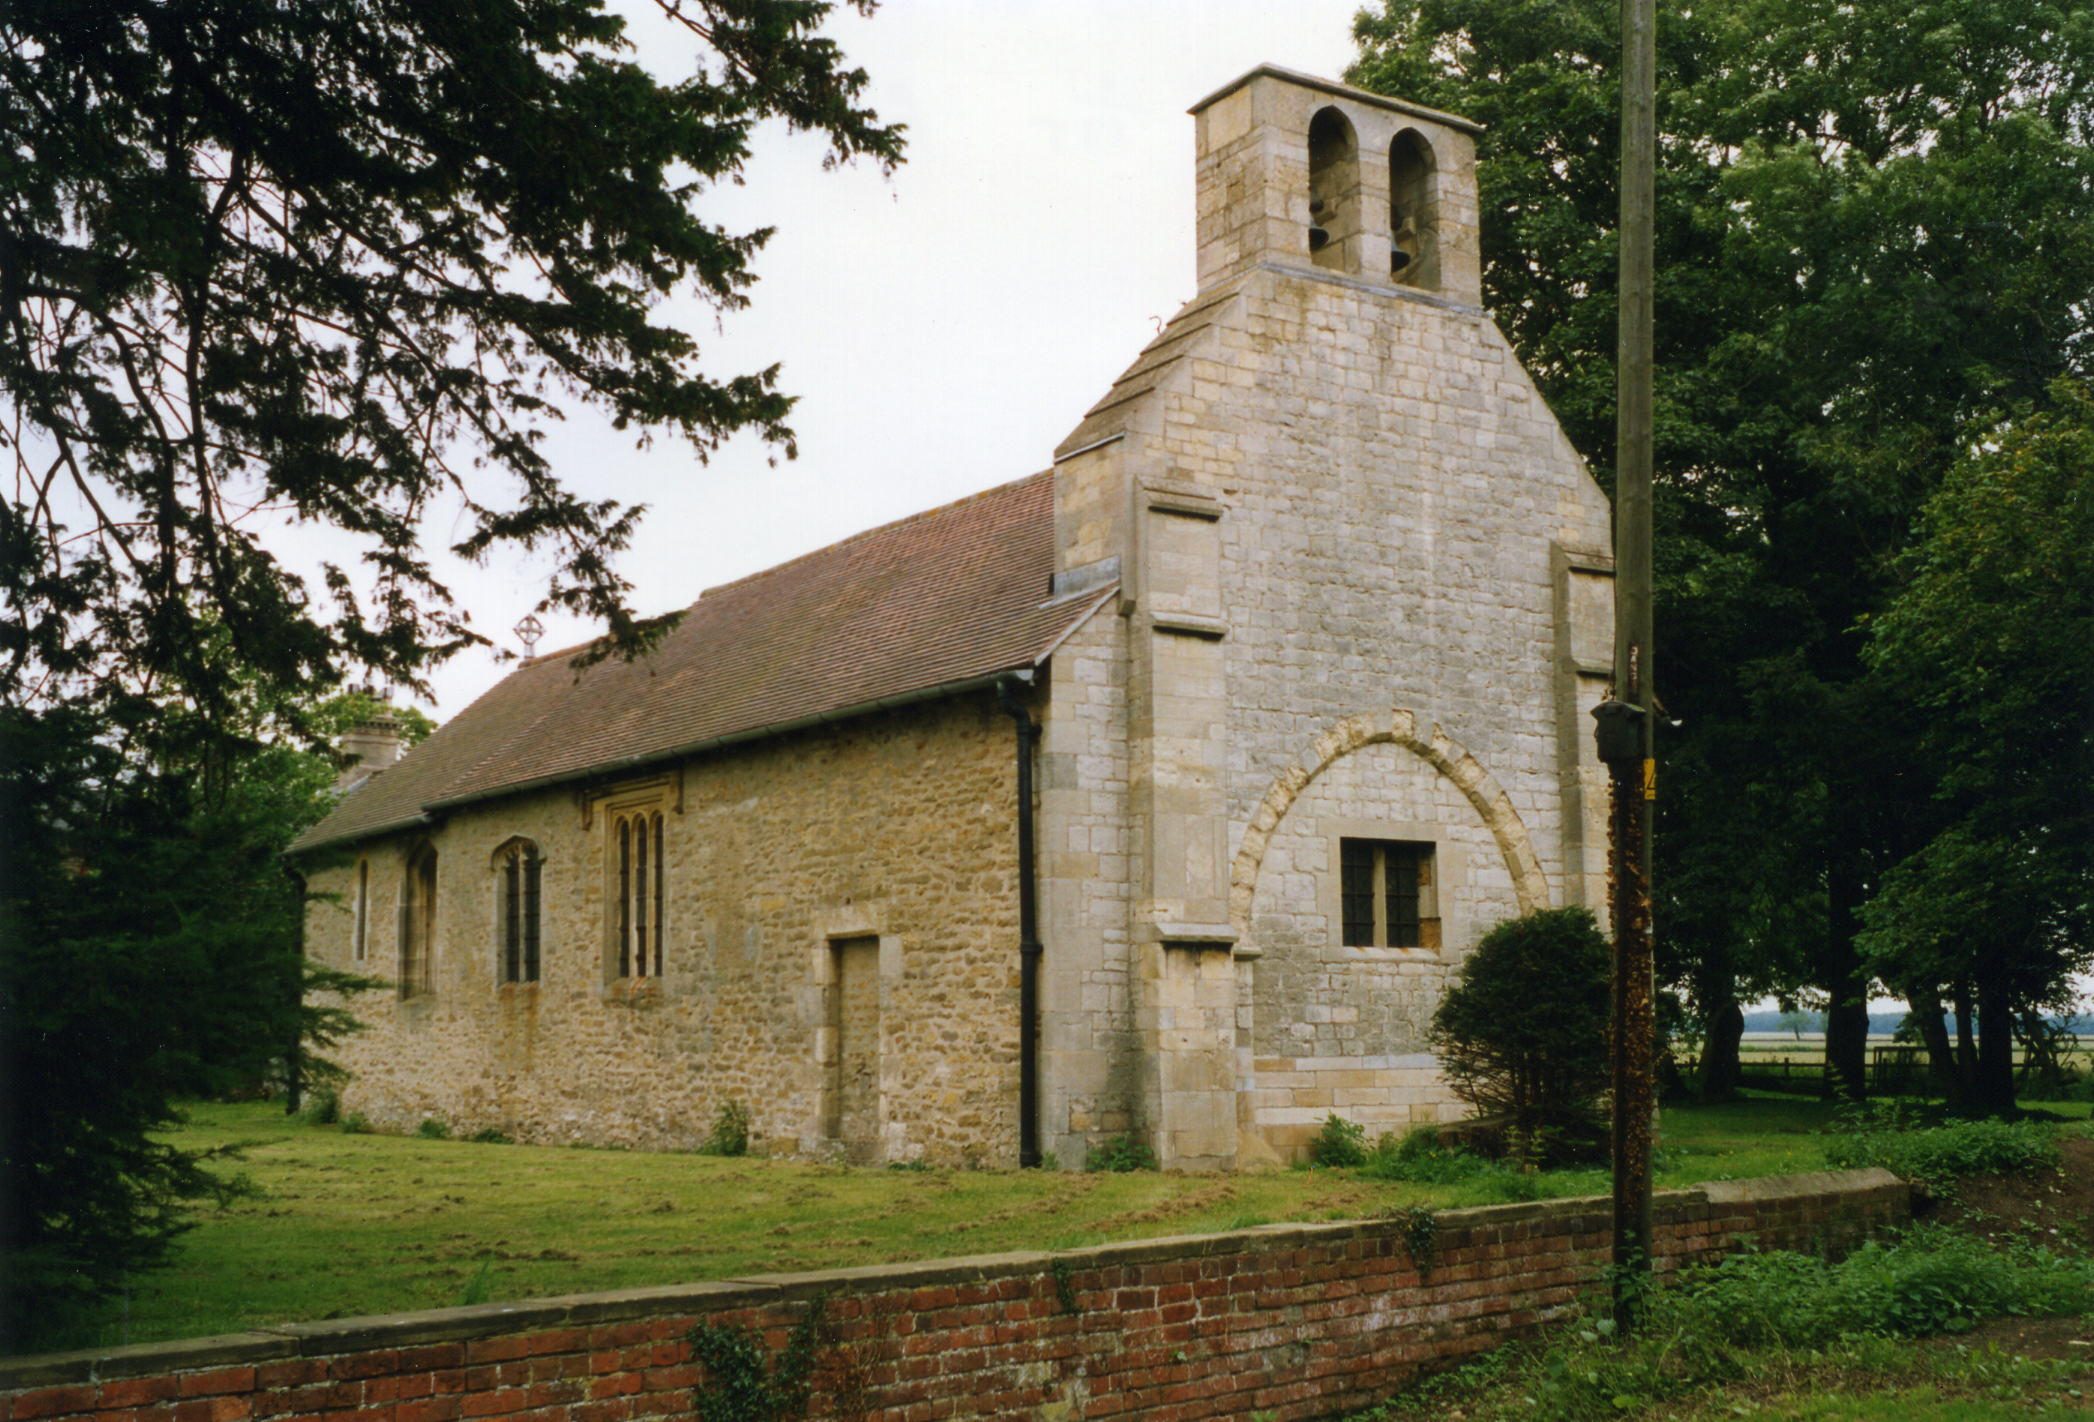 Coates Saint Edith parish church